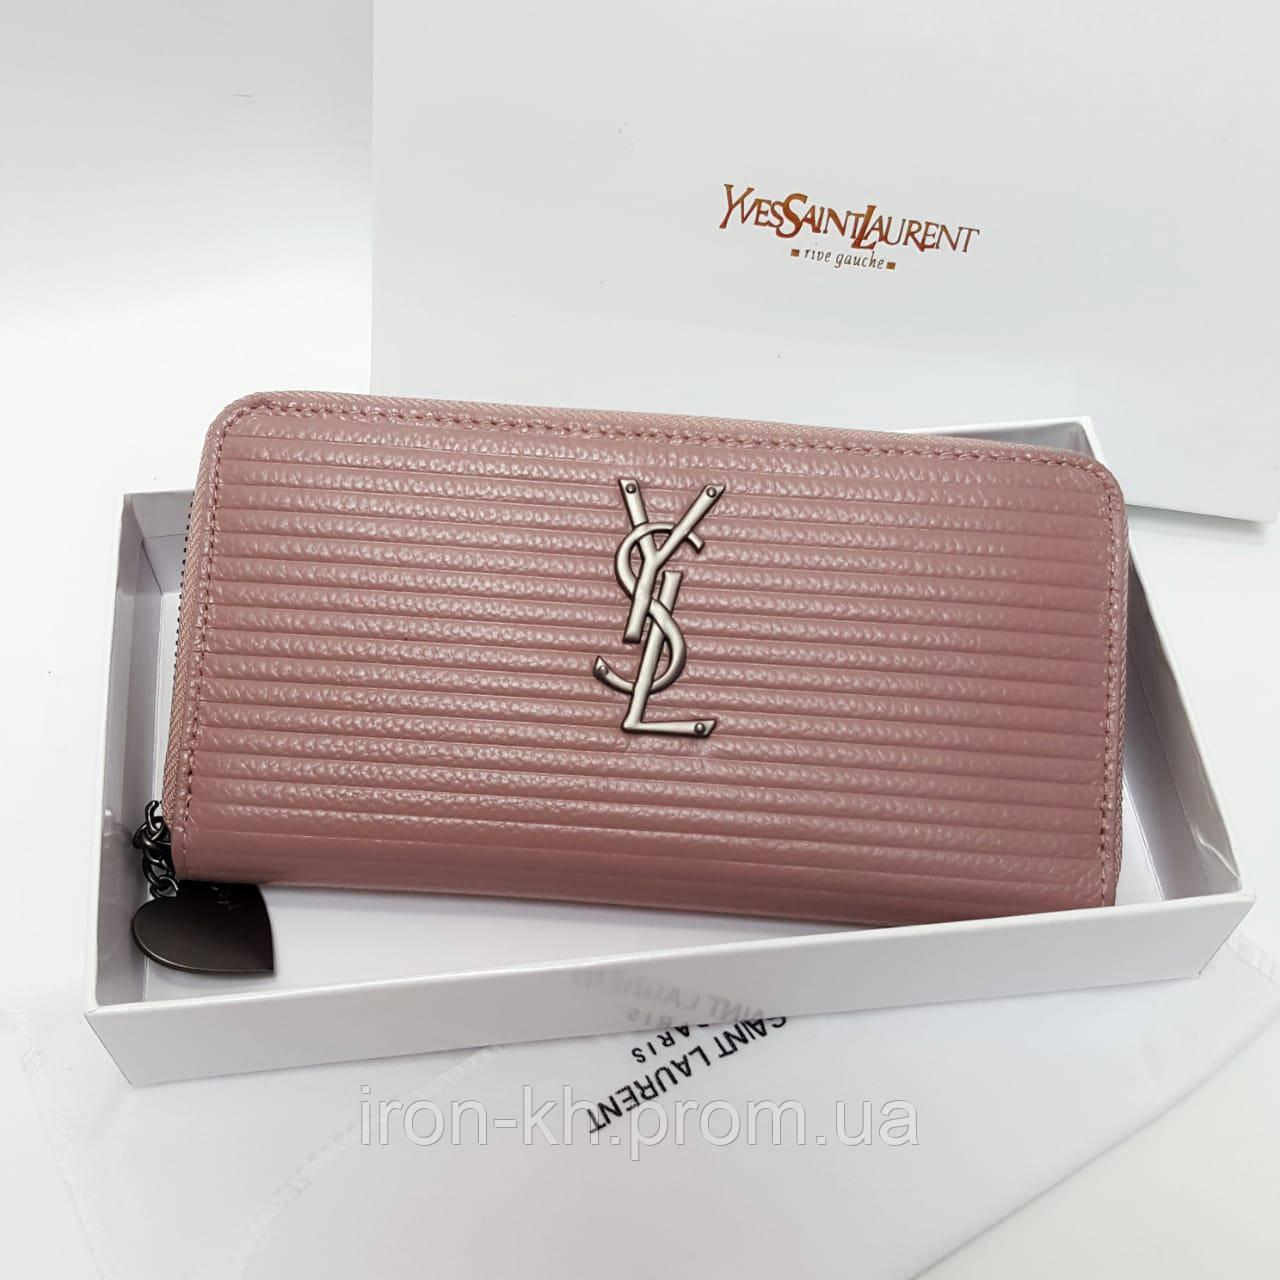 ec028ea6f232 Женский Кошелек Yves Saint Laurent : продажа, цена в Харькове ...